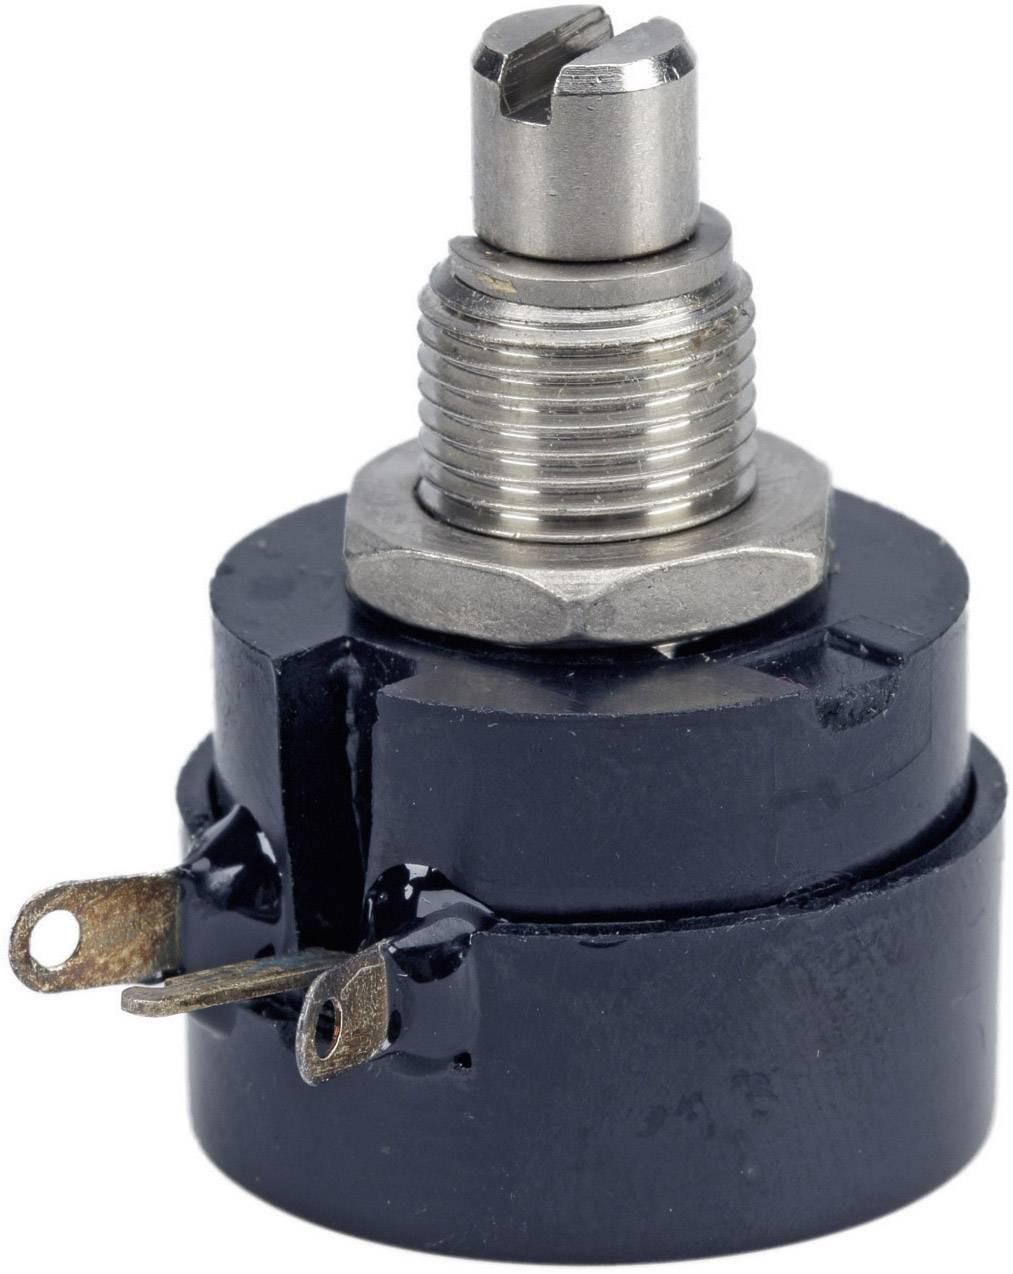 Drôtový potenciometer mono TT Electronics AB 3101106905 3101106905, 0.5 W, 50 Ohm, 1 ks